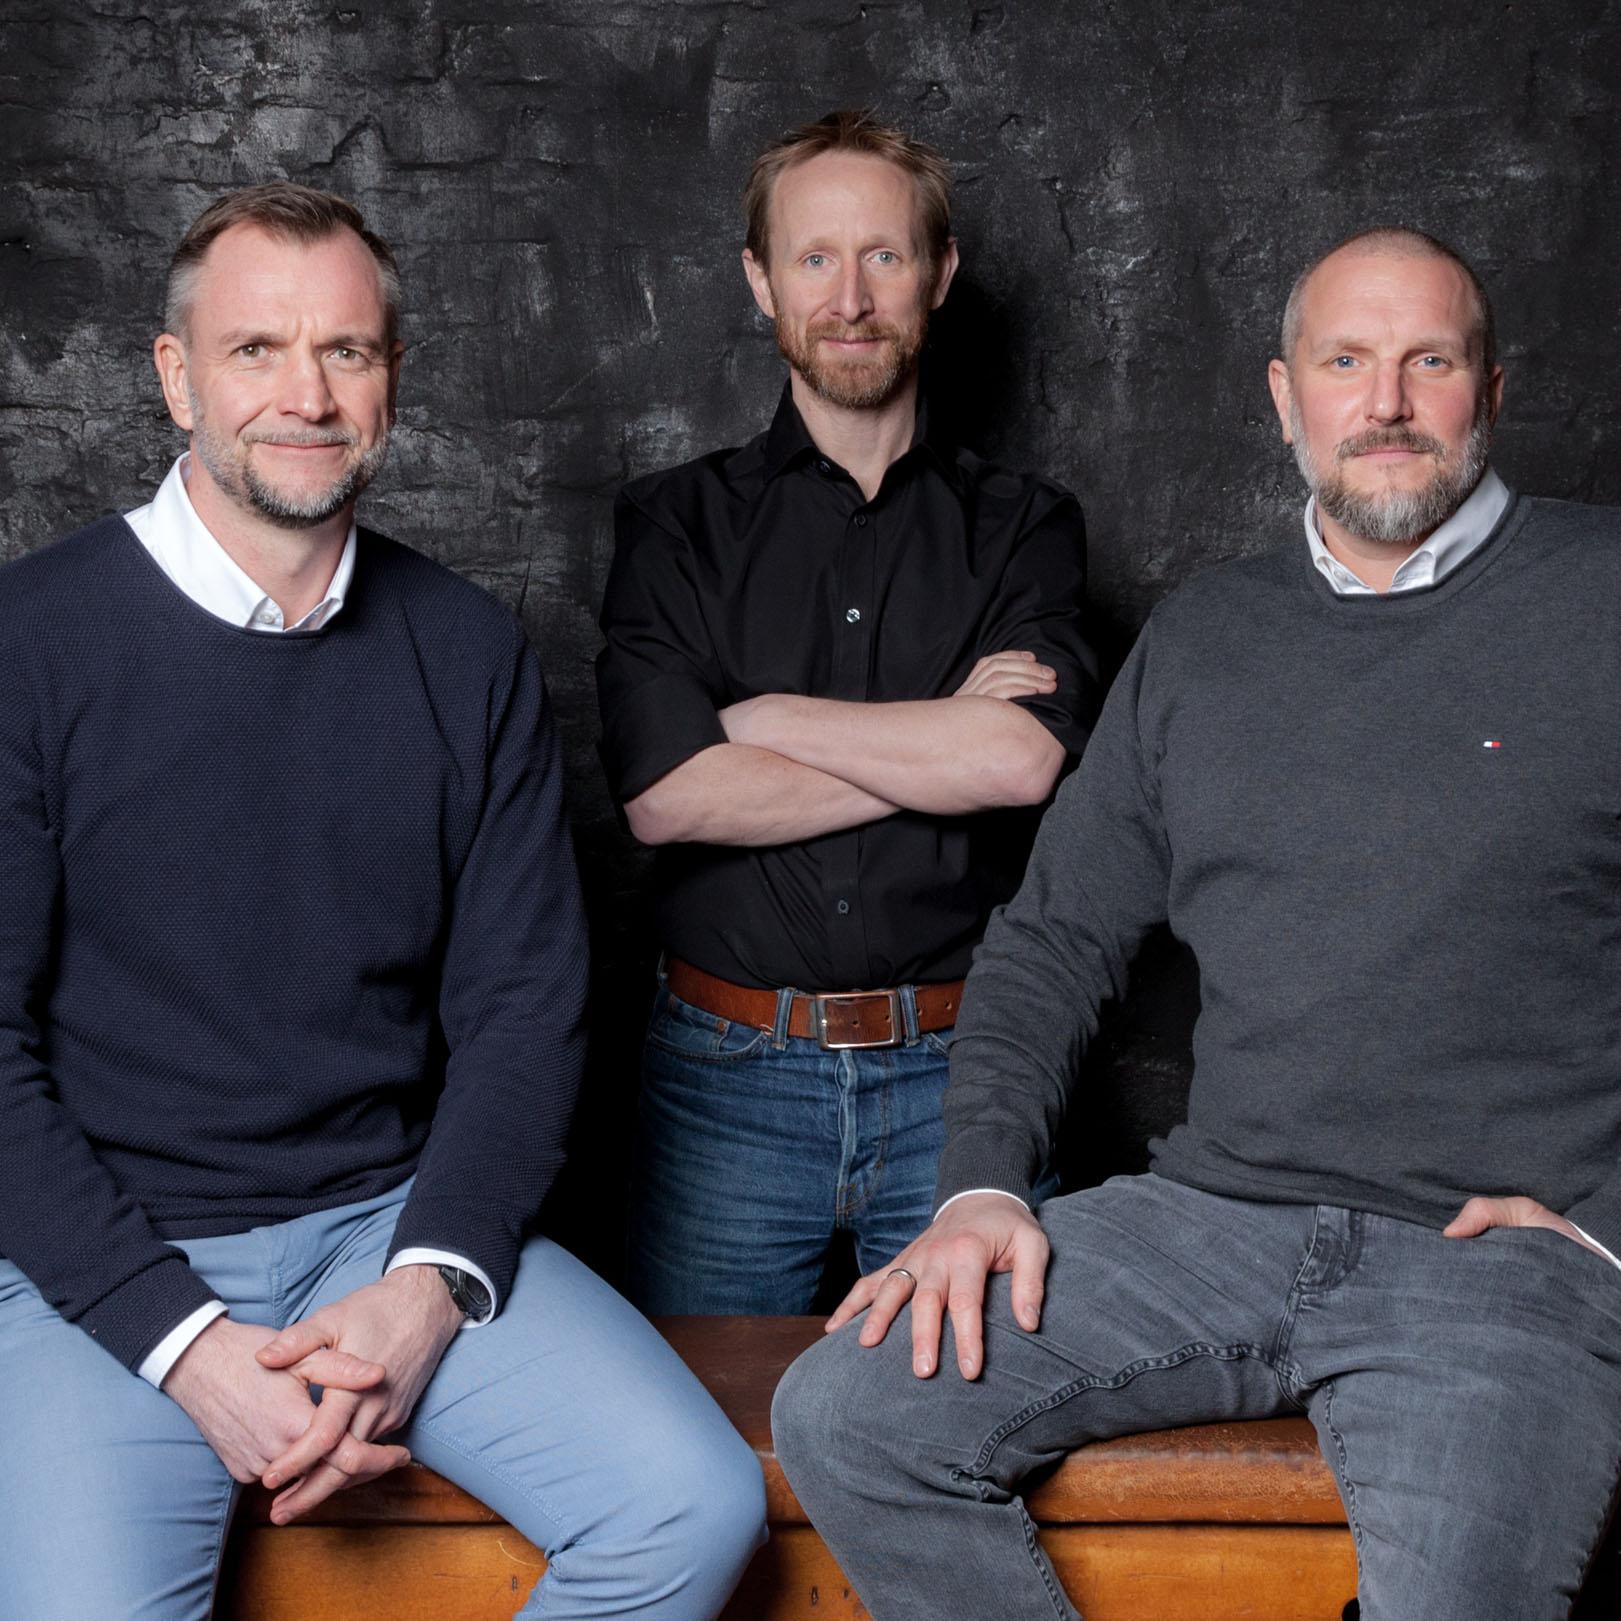 SMC - Michael Eckerl, Prof. Dr. Karsten Witte, Christian Dürwald